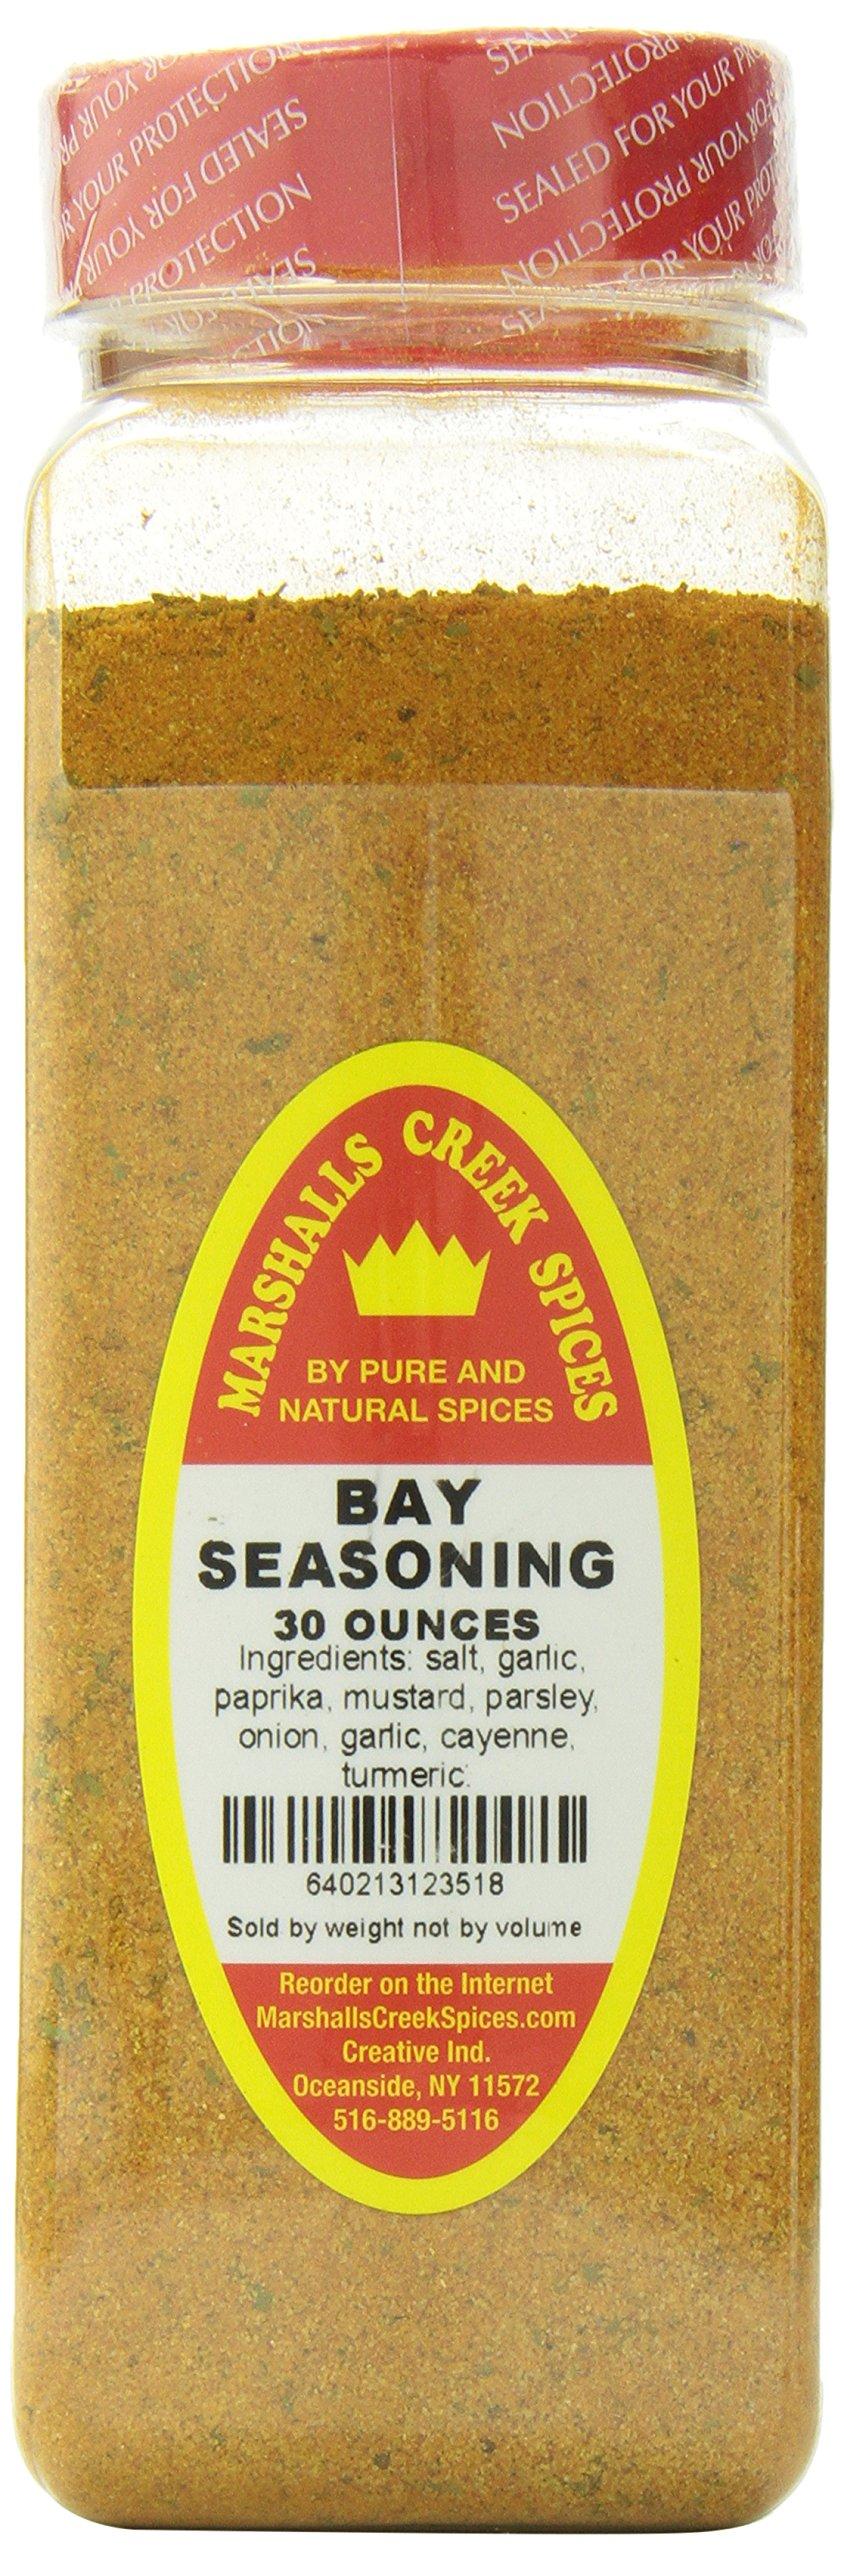 Marshalls Creek Spices Seasoning, Bay, XL Size, 30 Ounce